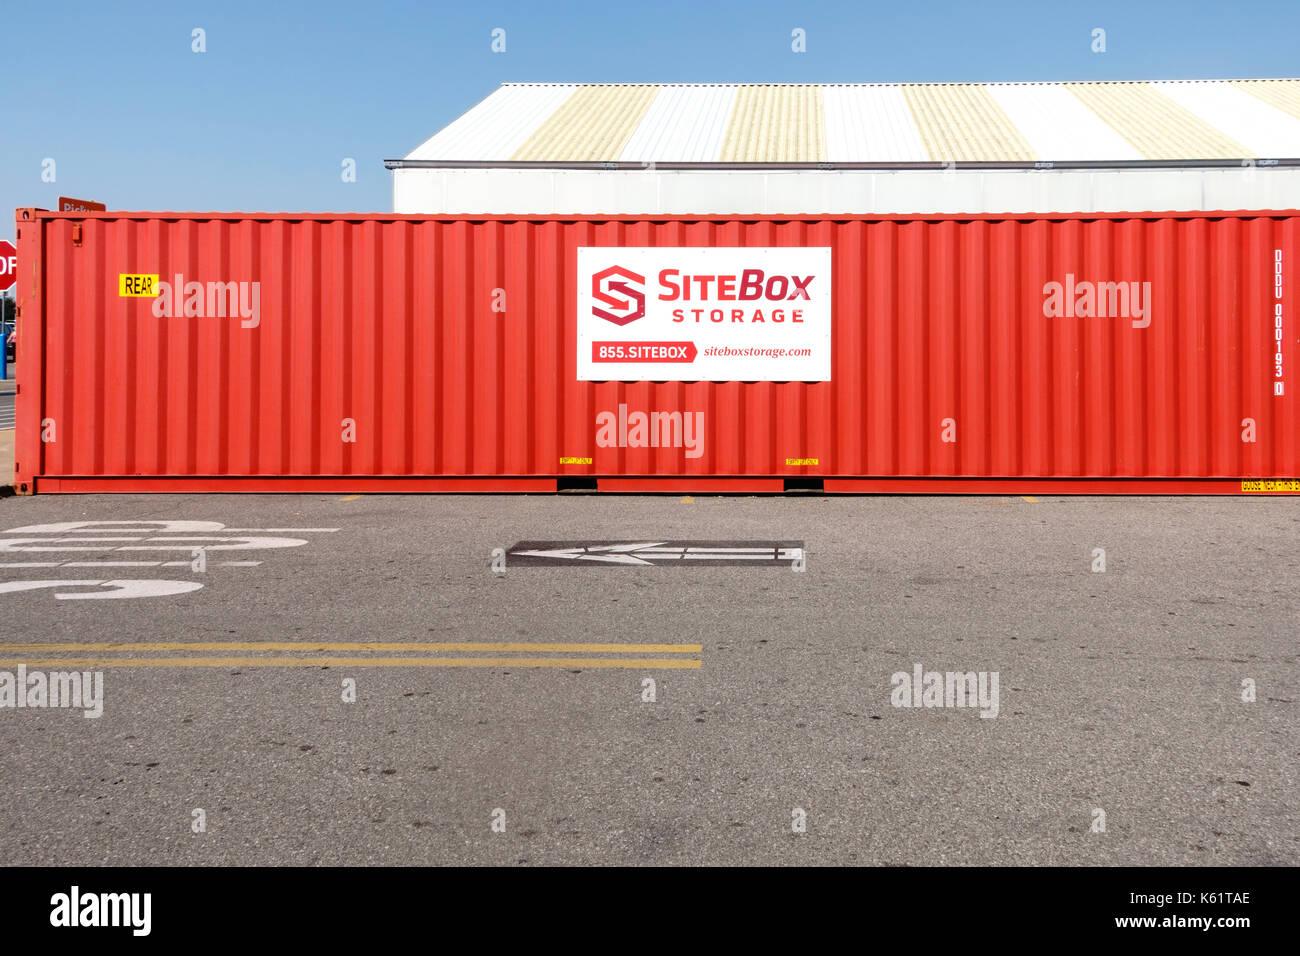 A red metal portable SiteBox storage bin in a Walmart parking lot